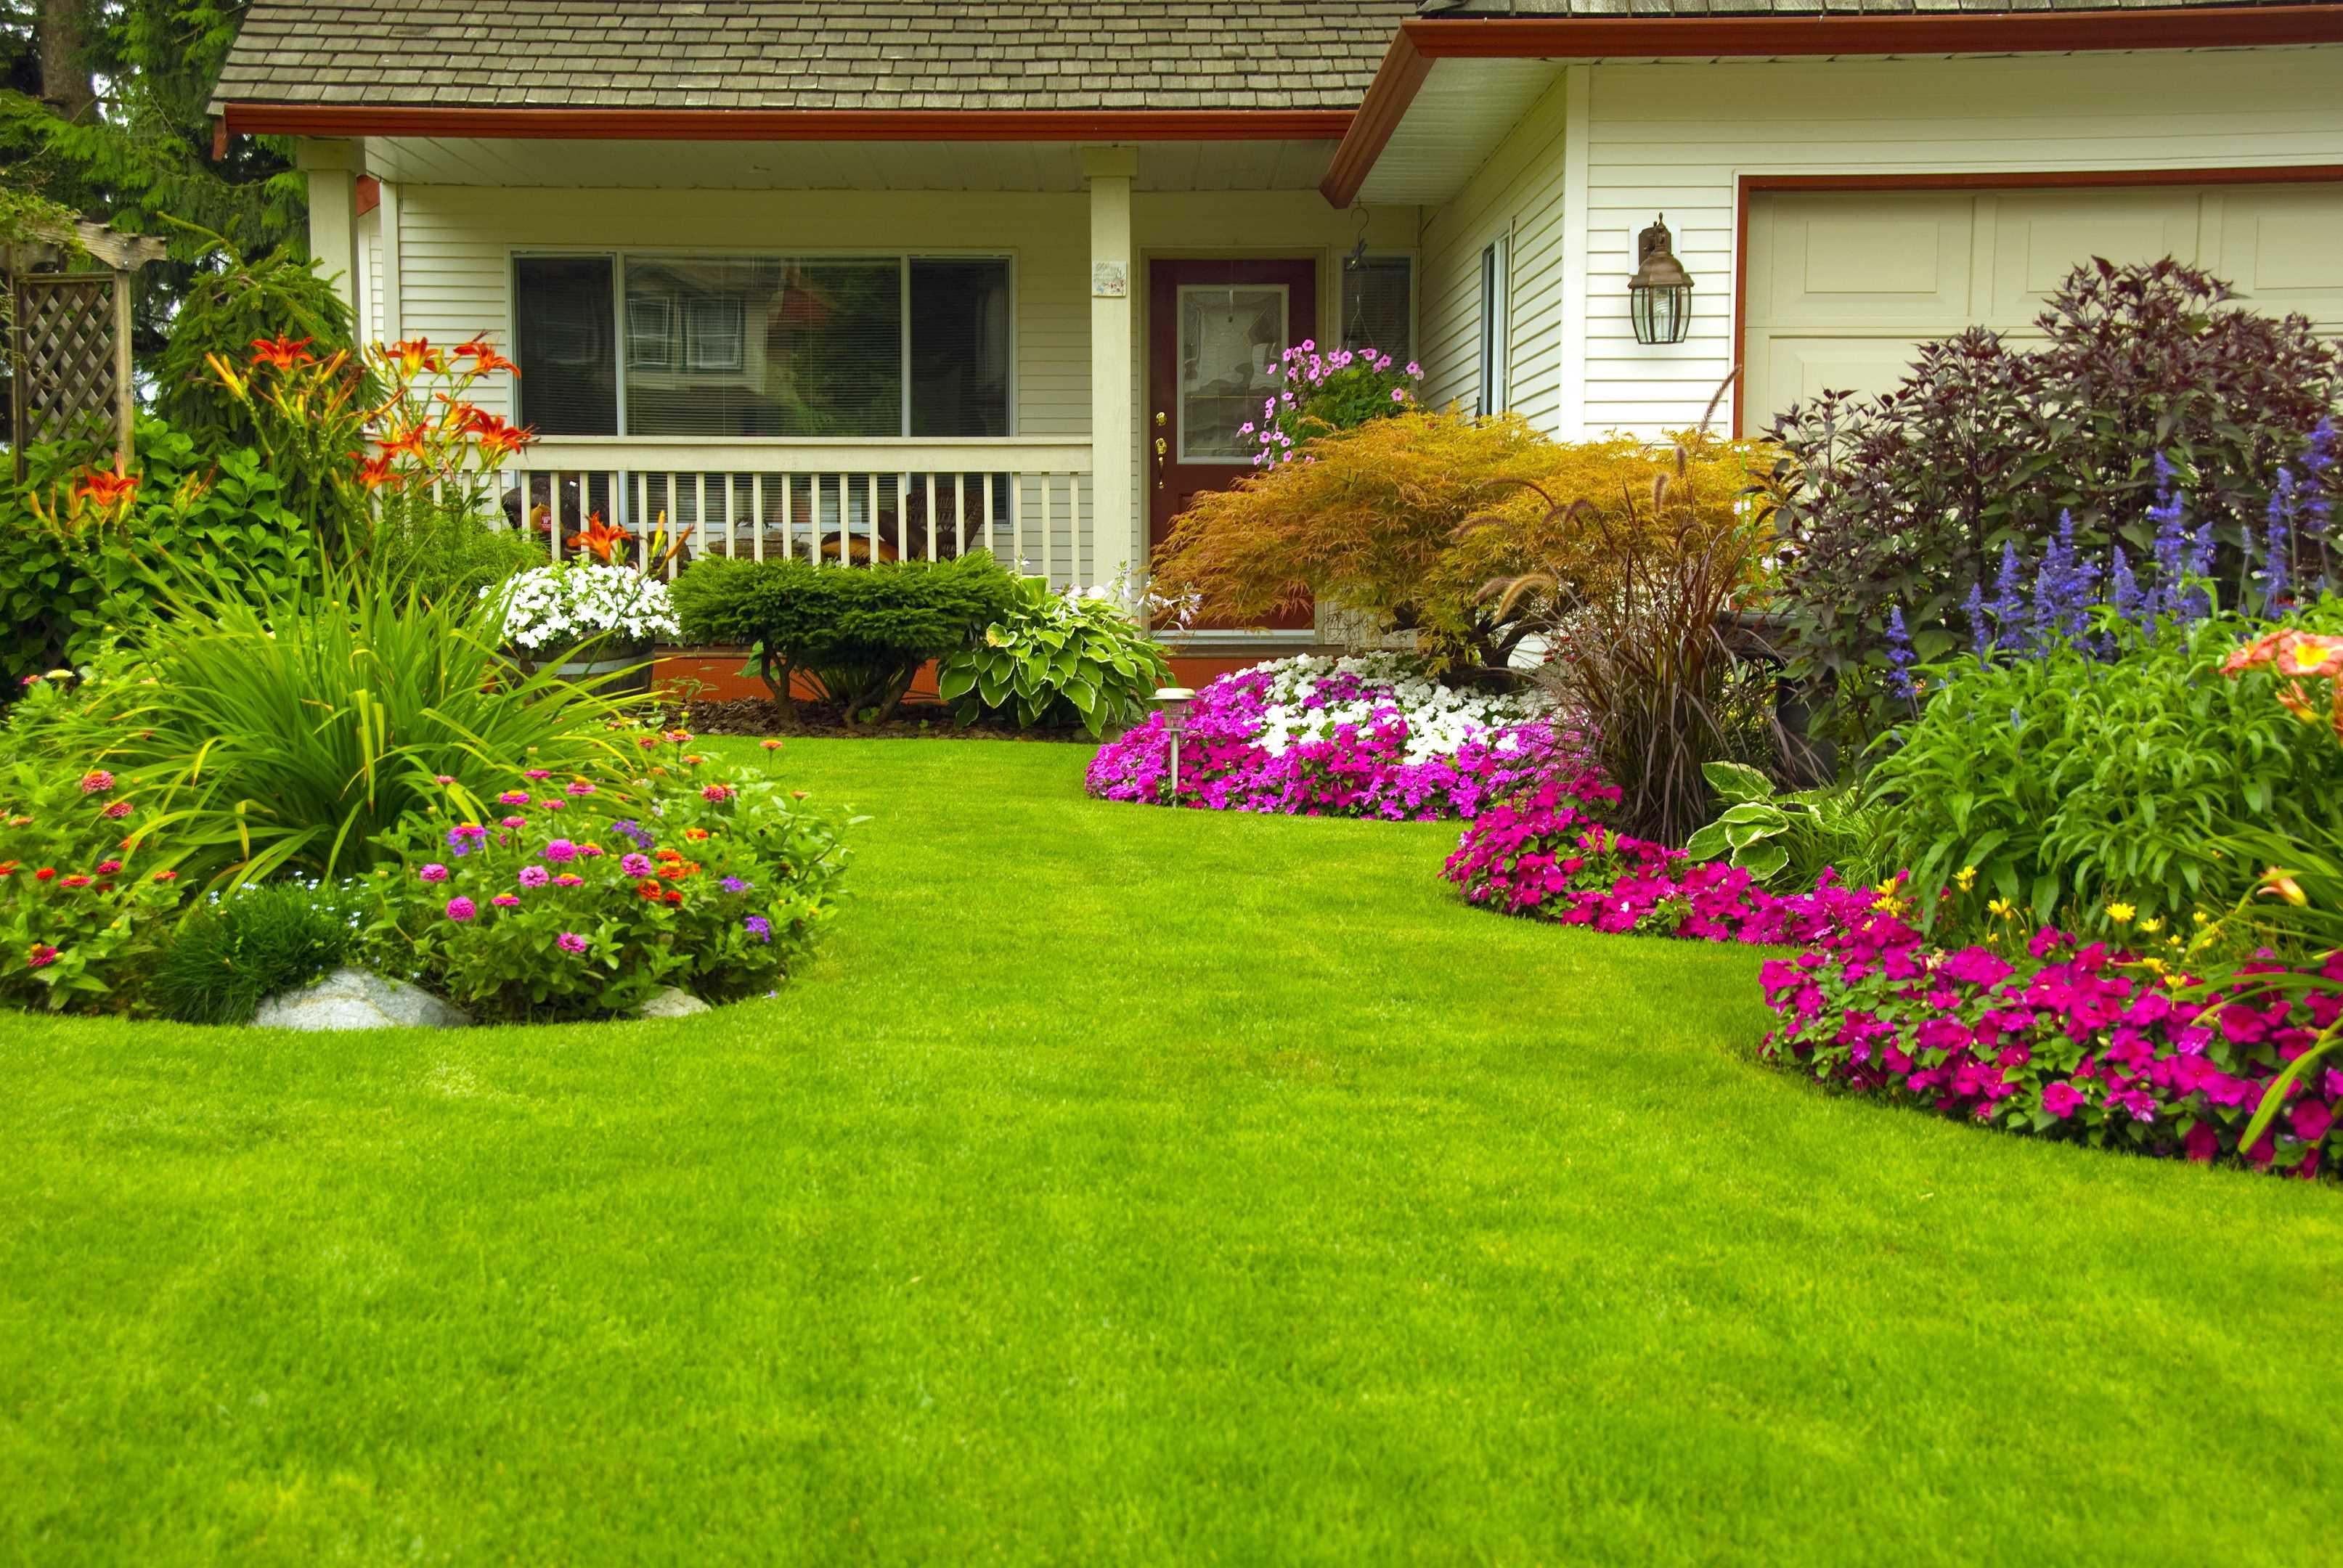 Maintenance/Lawn Care